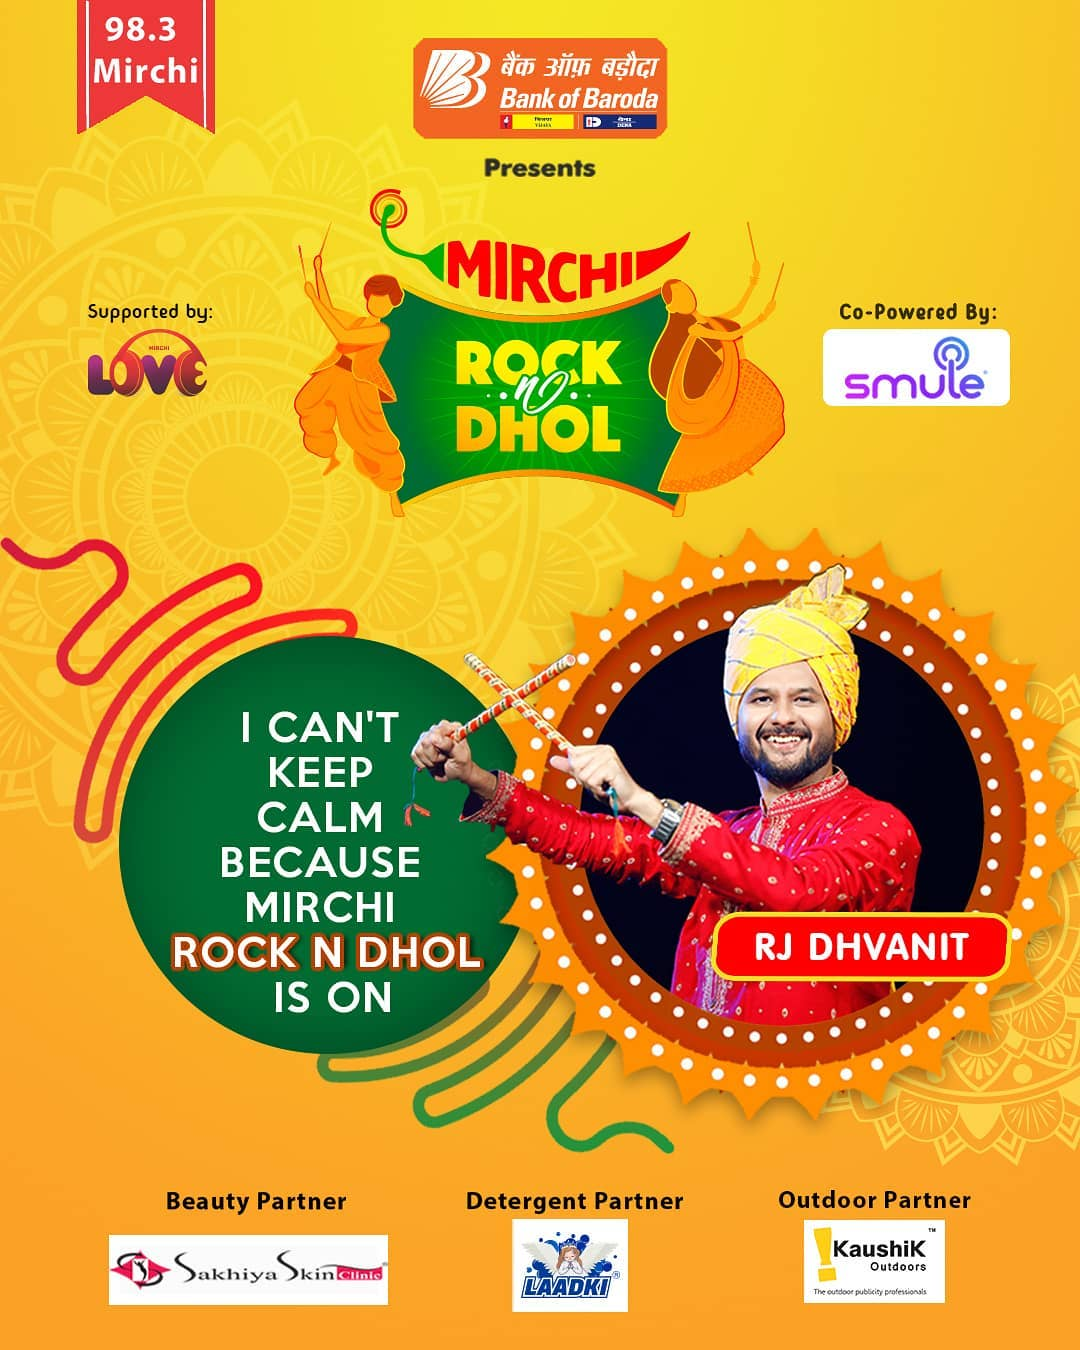 Tune in to Mirchi 98.3 everyday at 9 PM!  Mirchi Rock N Dhol Presented by @officialbankofbaroda Co powered by @smulein In association with  @laadki_detergent @sakhiyaskinclinic   #rjdhvanit #dhvanit #rockndhol  #RadioMirchi #MirchiGujarati #gujarat #garba #raas #ahmedabad #surat #baroda #rajkot #vadodara